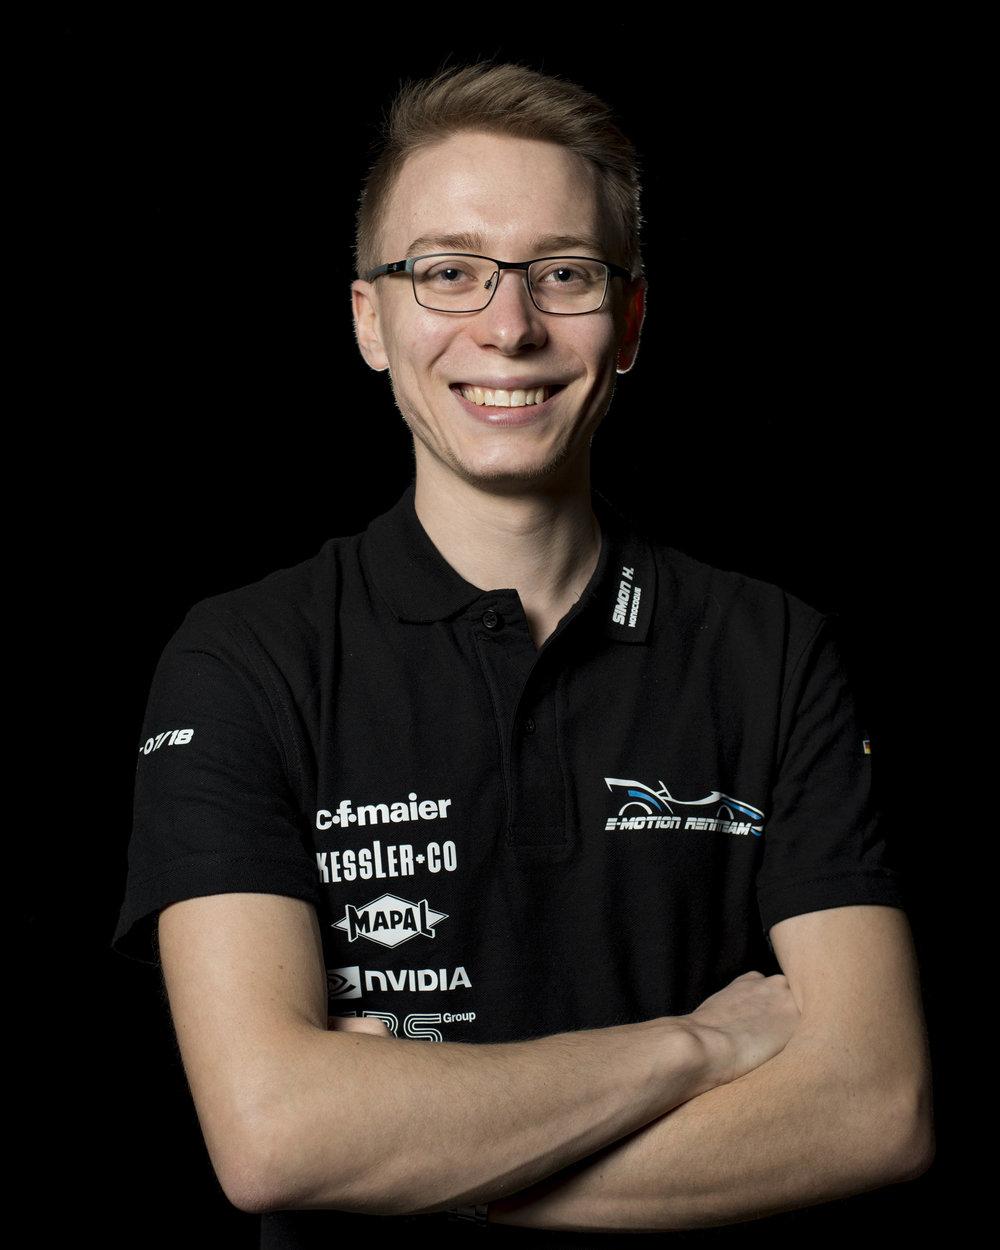 Simon Häbich / Seat